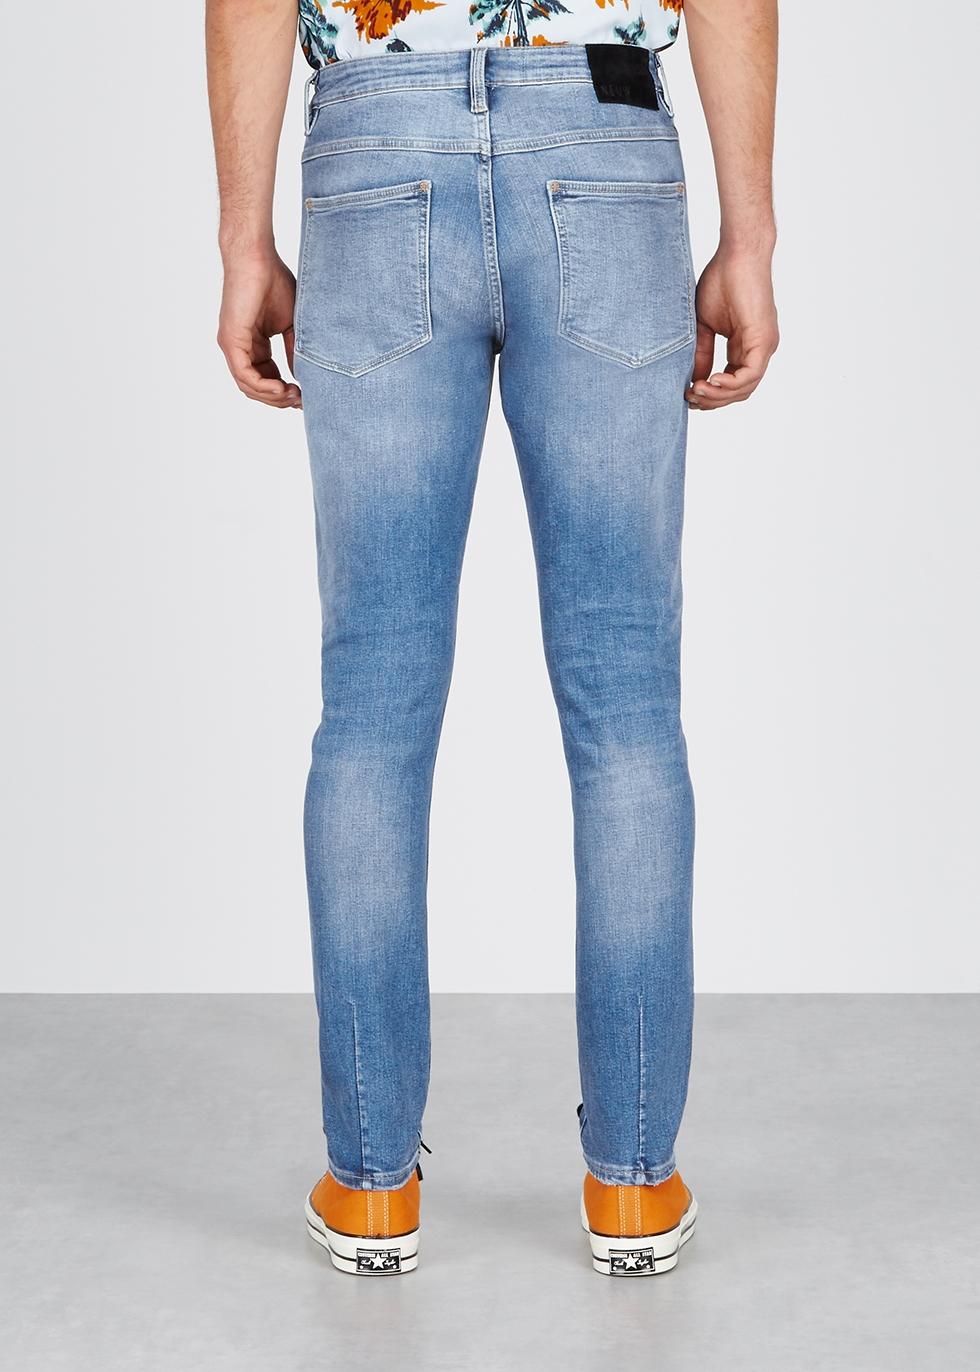 Rebel Form light blue skinny jeans - Neuw